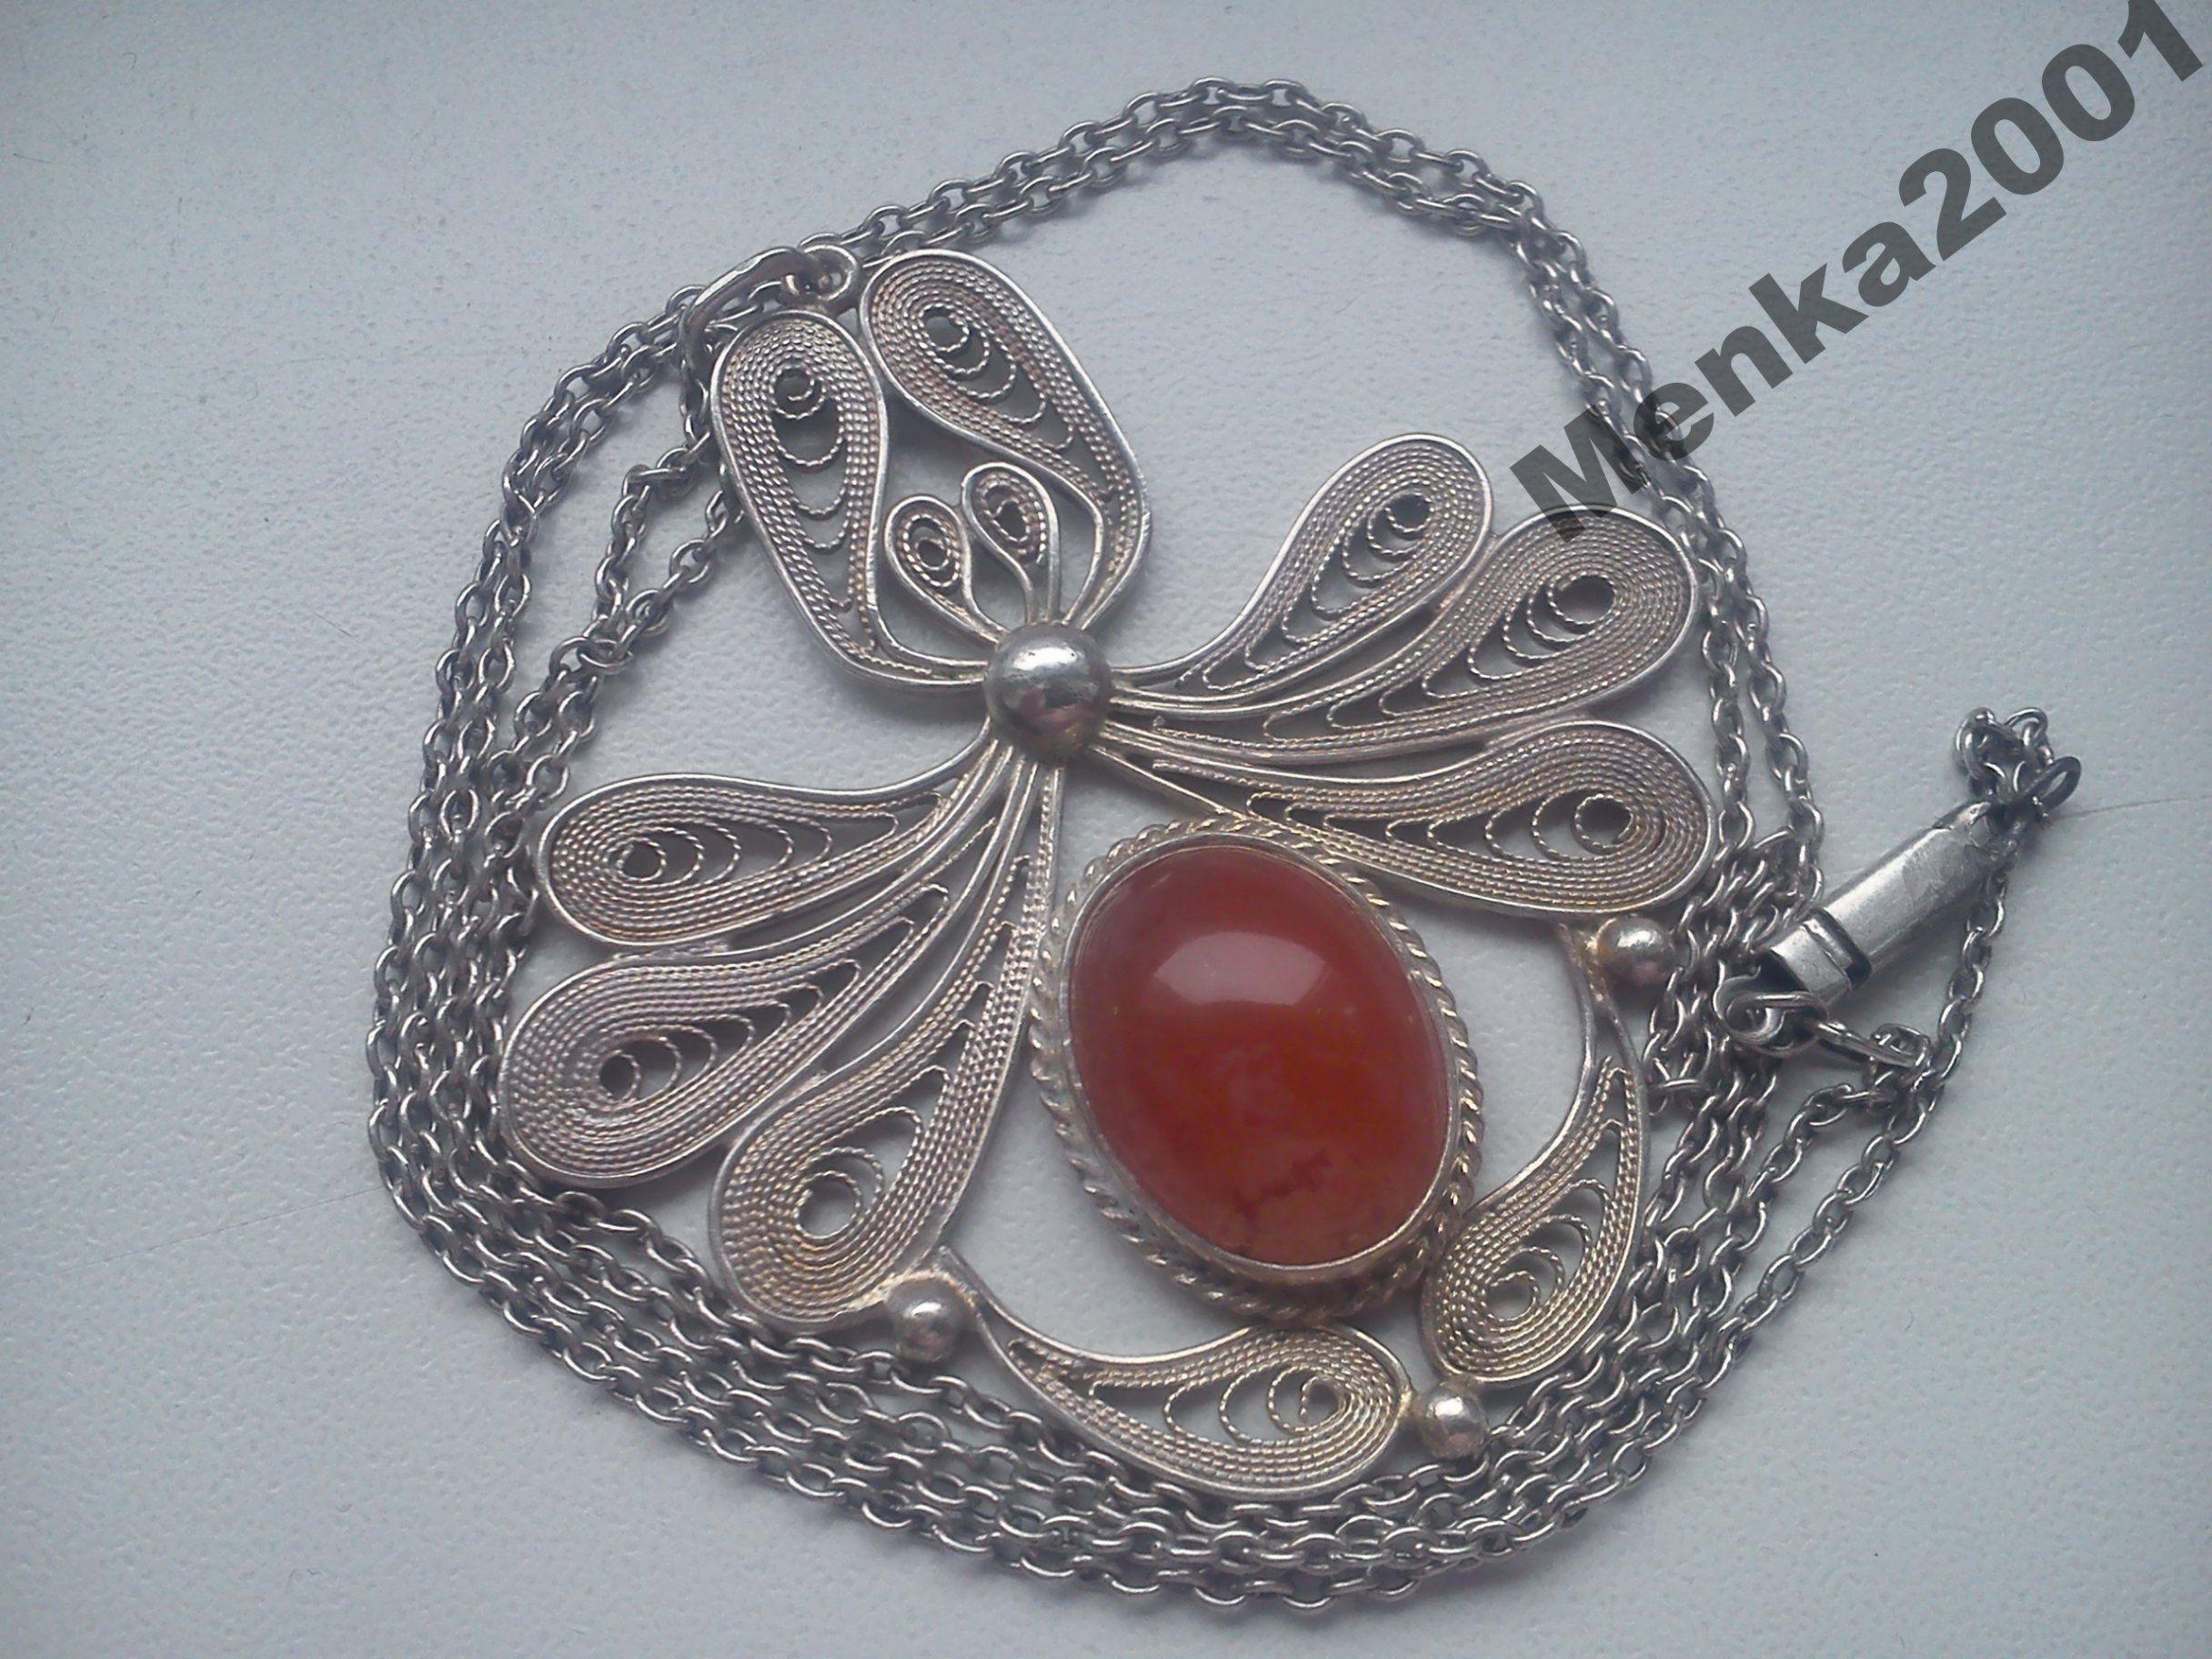 Naszyjnik Imago Artis Arty Polish Jewelry Vintage Polish